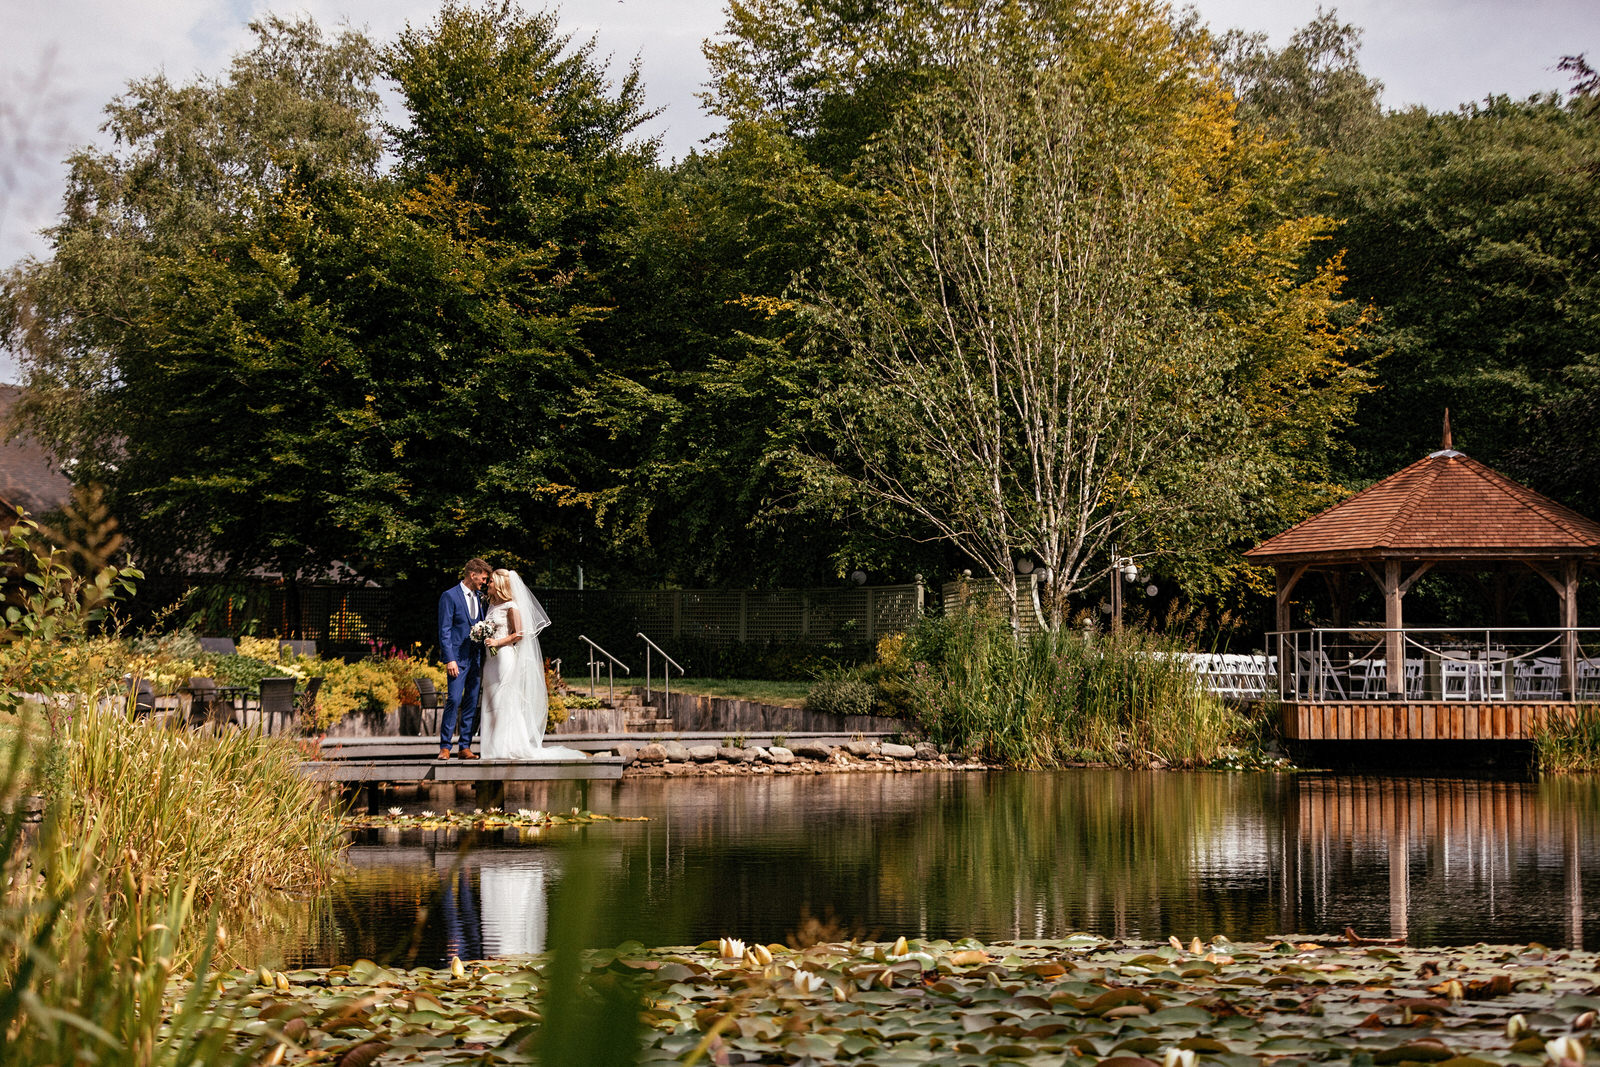 Moddershall-Oaks-Spa-Wedding-Photographer-045.jpg